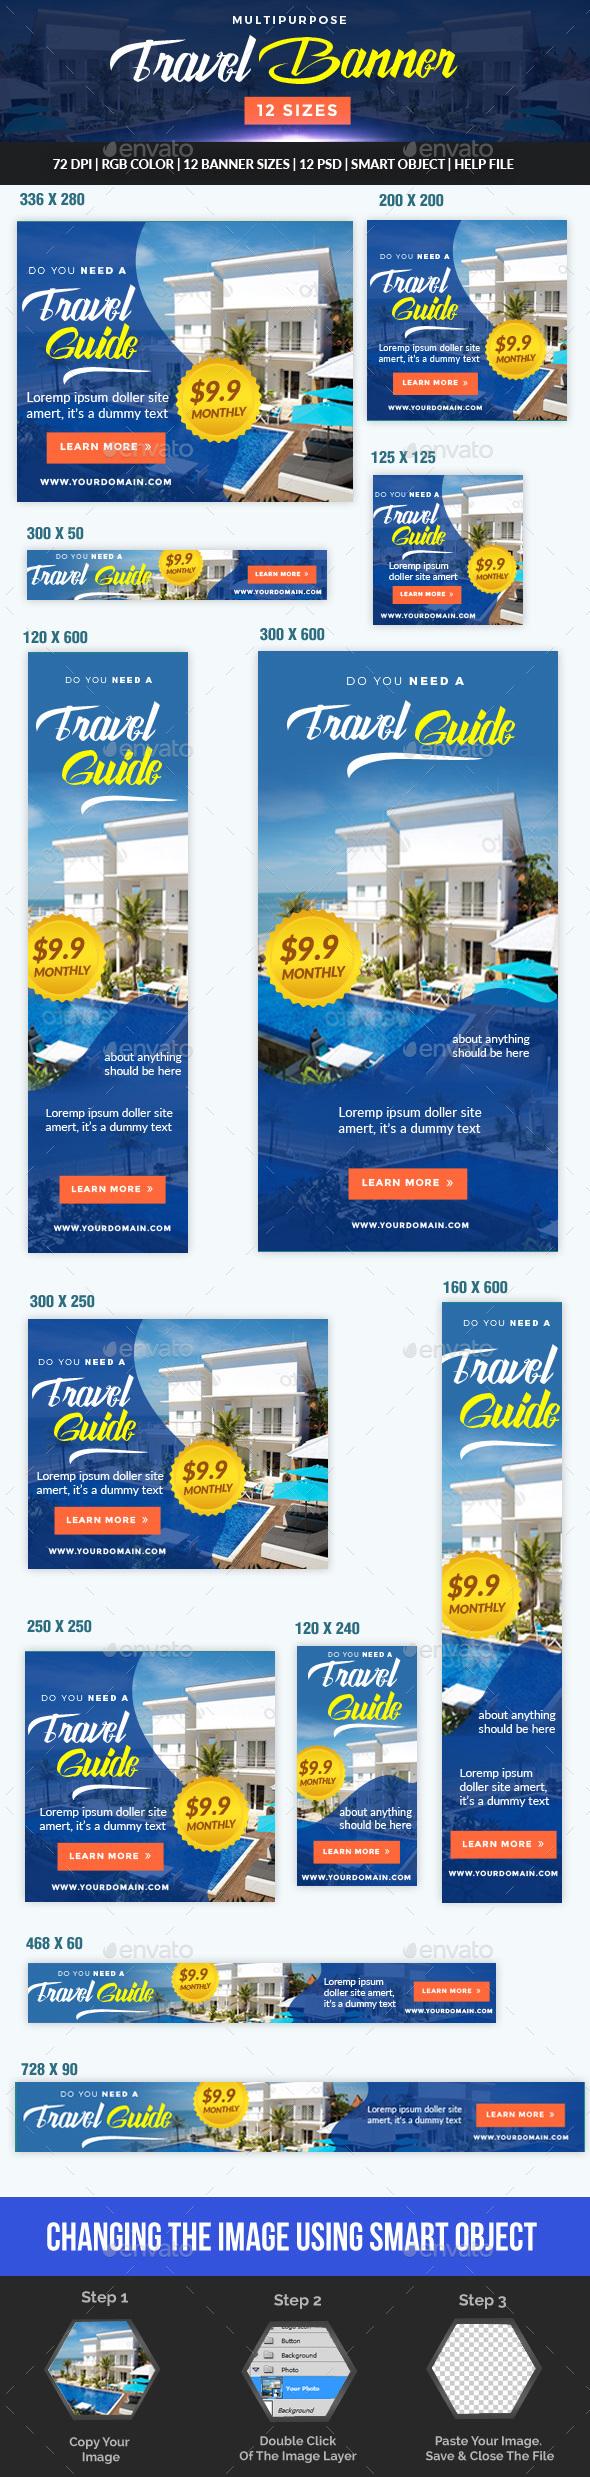 Multipurpose Travel And Hotel Banner By Desainpro